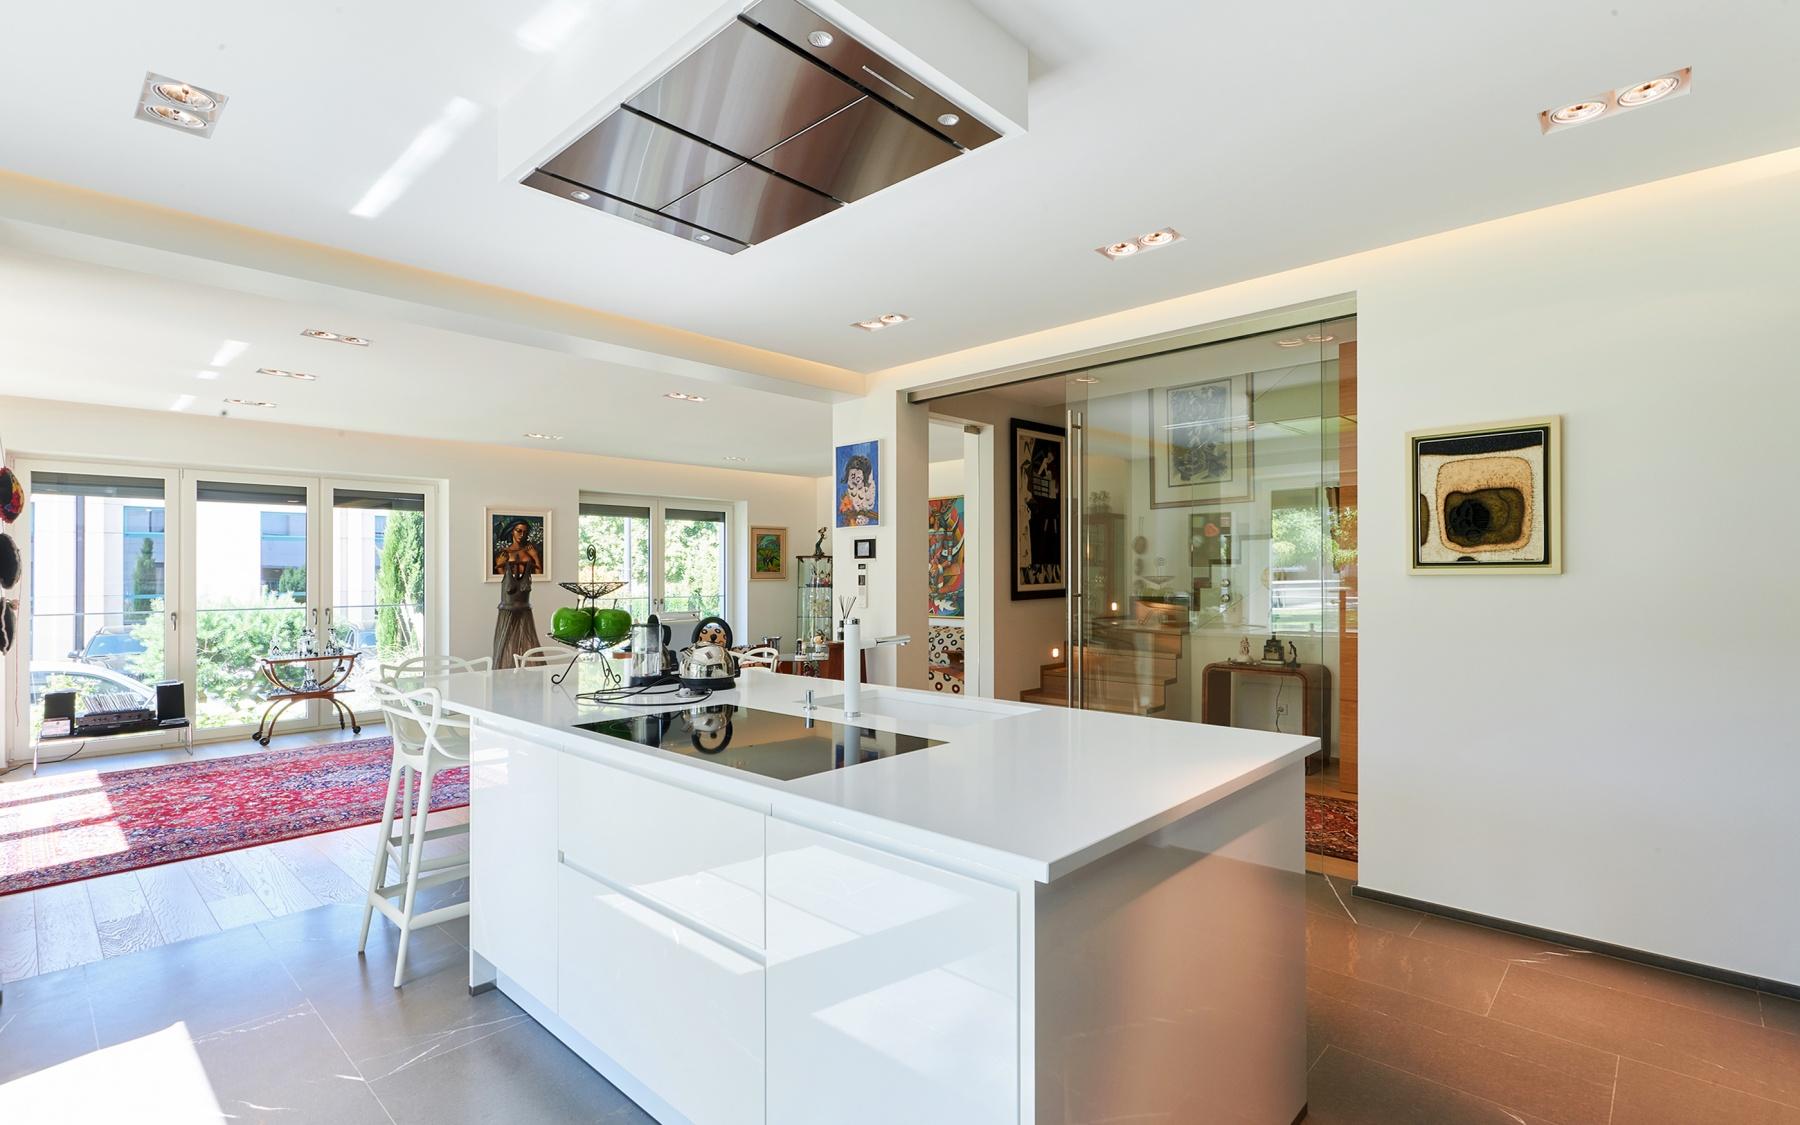 Maison moderne à Luxembourg-Limpertsberg